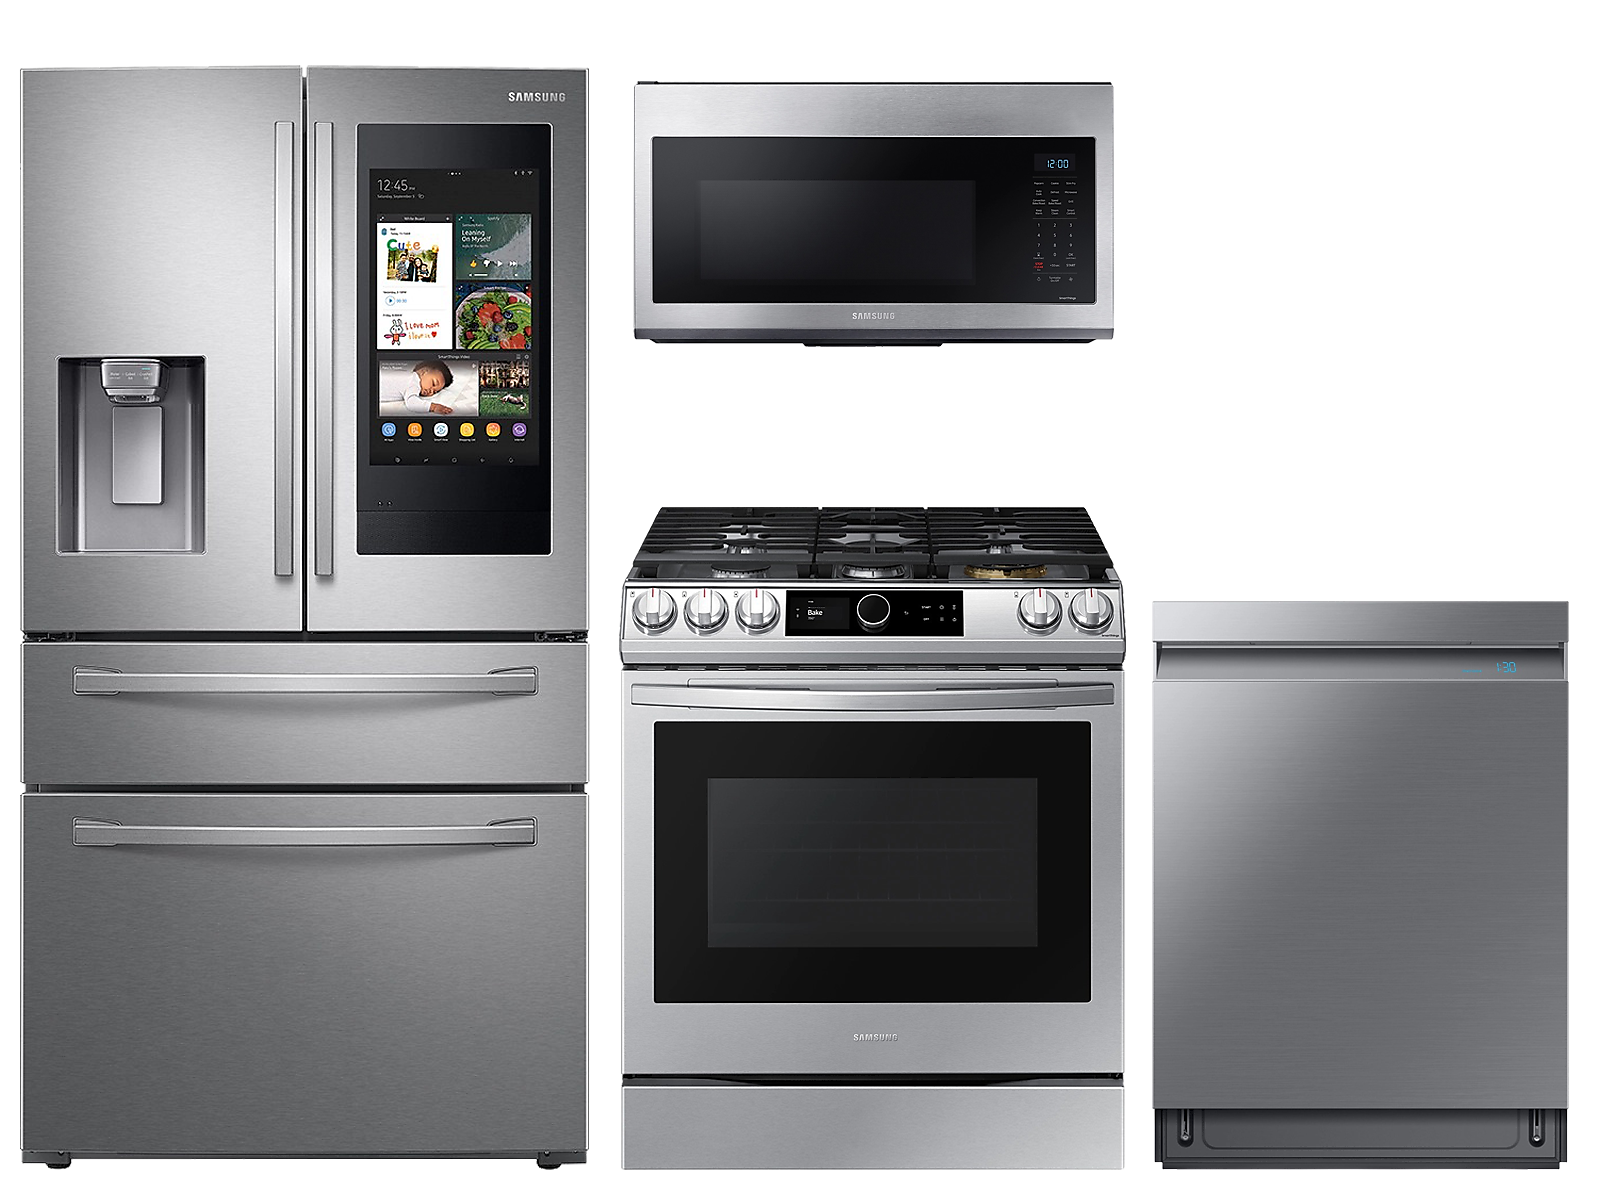 Samsung coupon: Samsung 28 cu. ft. Family HubTM 4-door refrigerator, gas range, microwave and Smart Linear dishwasher package(BNDL-1614632864478)